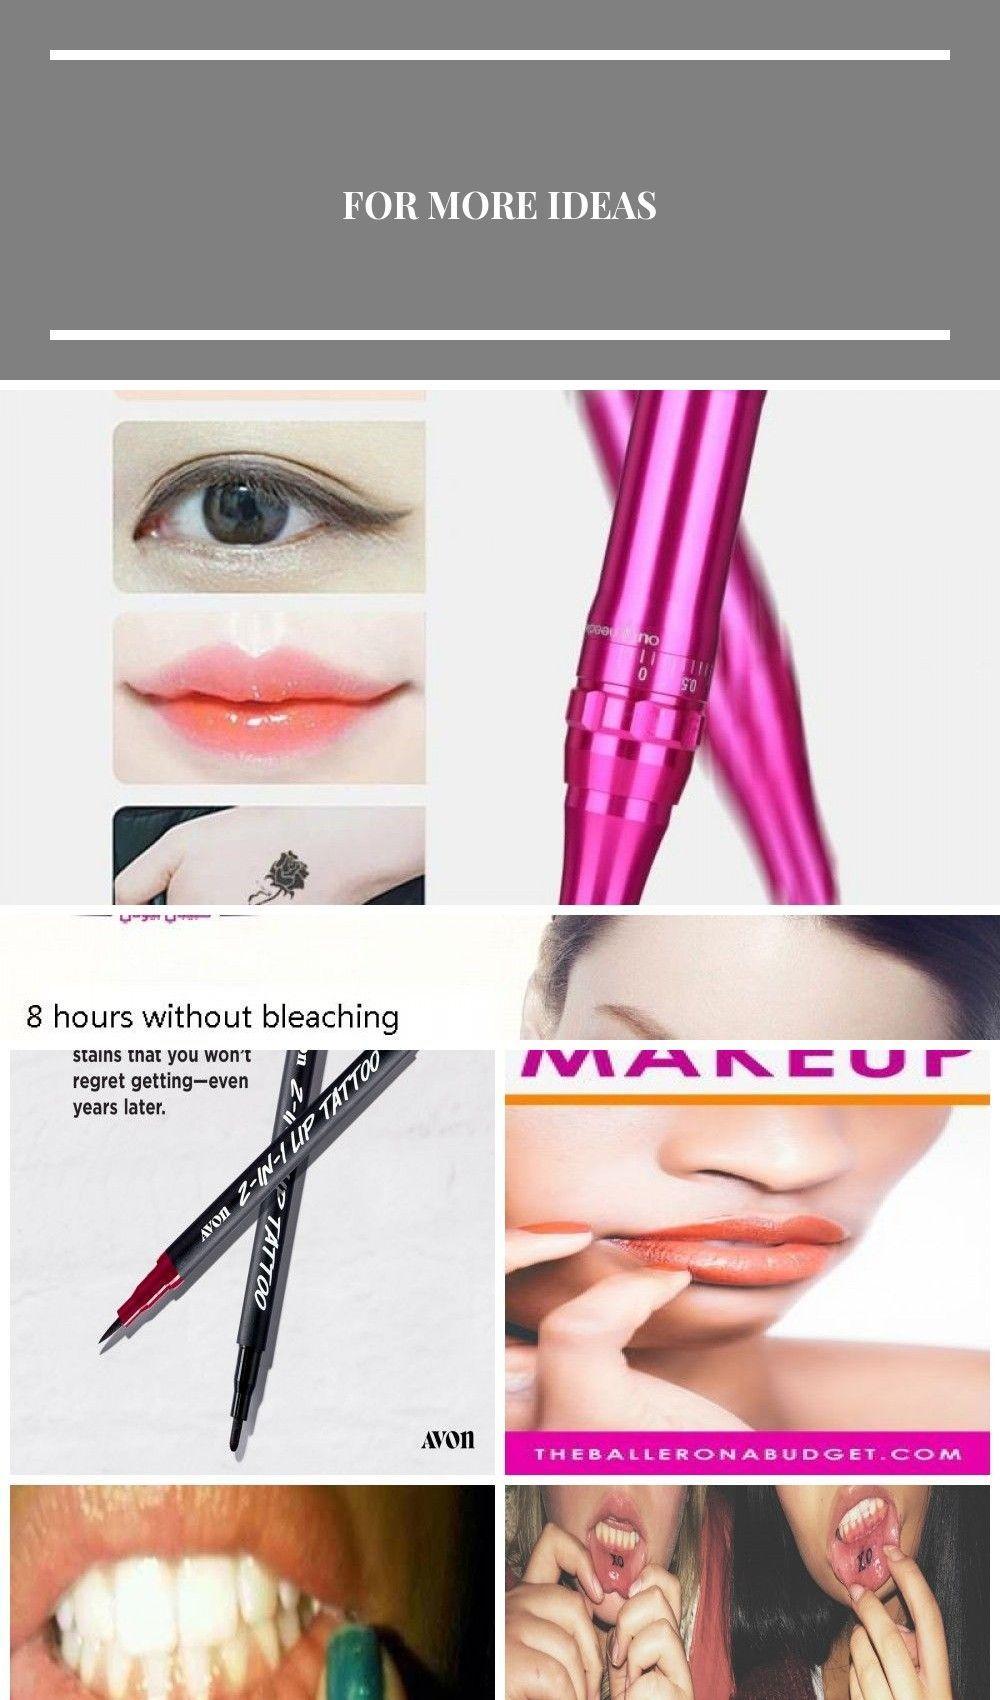 35000 RPM Permanent Make-up Maschine Augenbrauen Eyeliner Lip Tattoo Micro-Nadel Stift 1 ... - 350